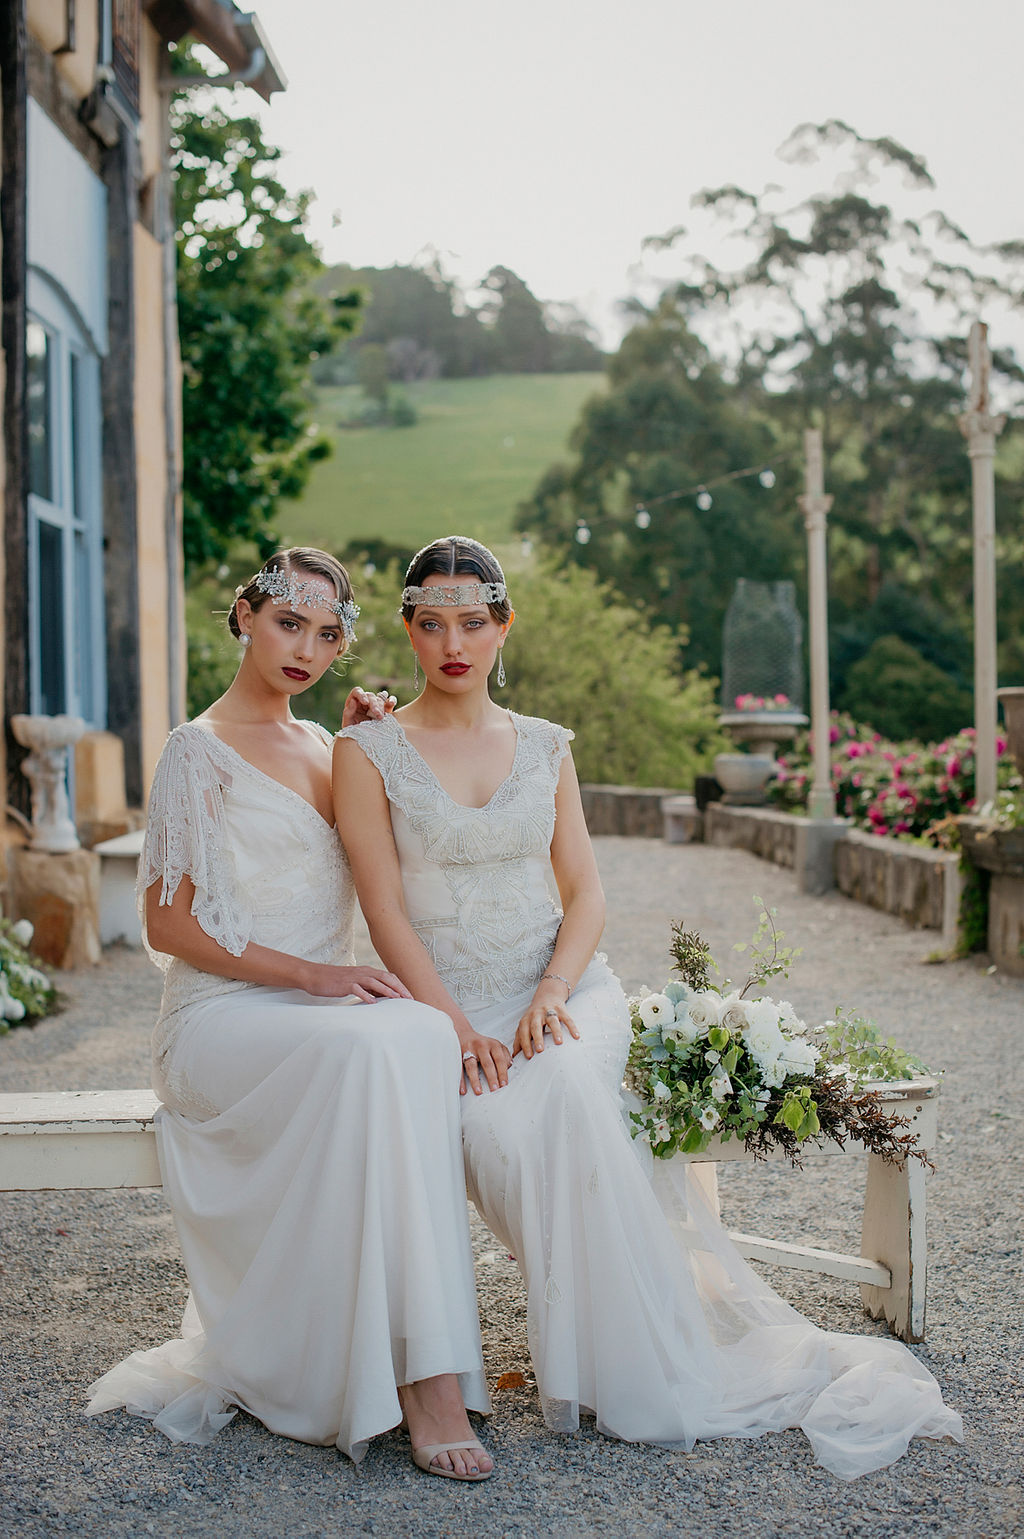 Norma and Elke Gwendolynne Wedding Dress  JessicaAbbyartdecoWEB-9035.jpg